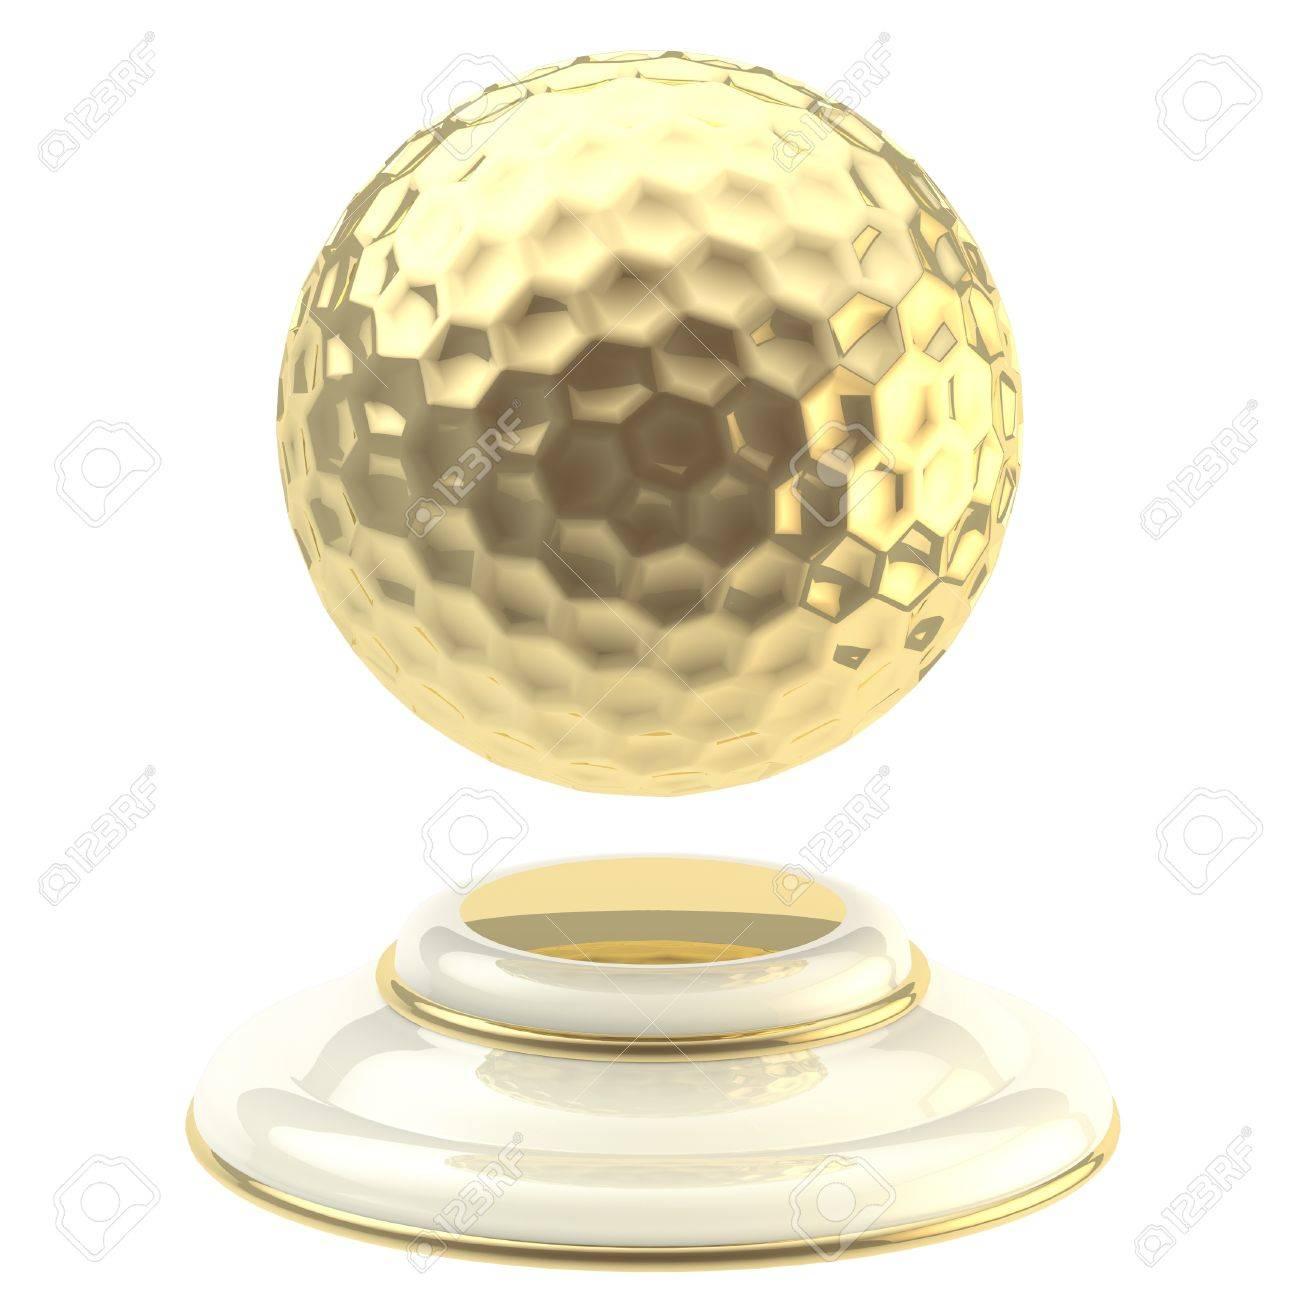 Golden golf ball champion goblet Stock Photo - 13093016